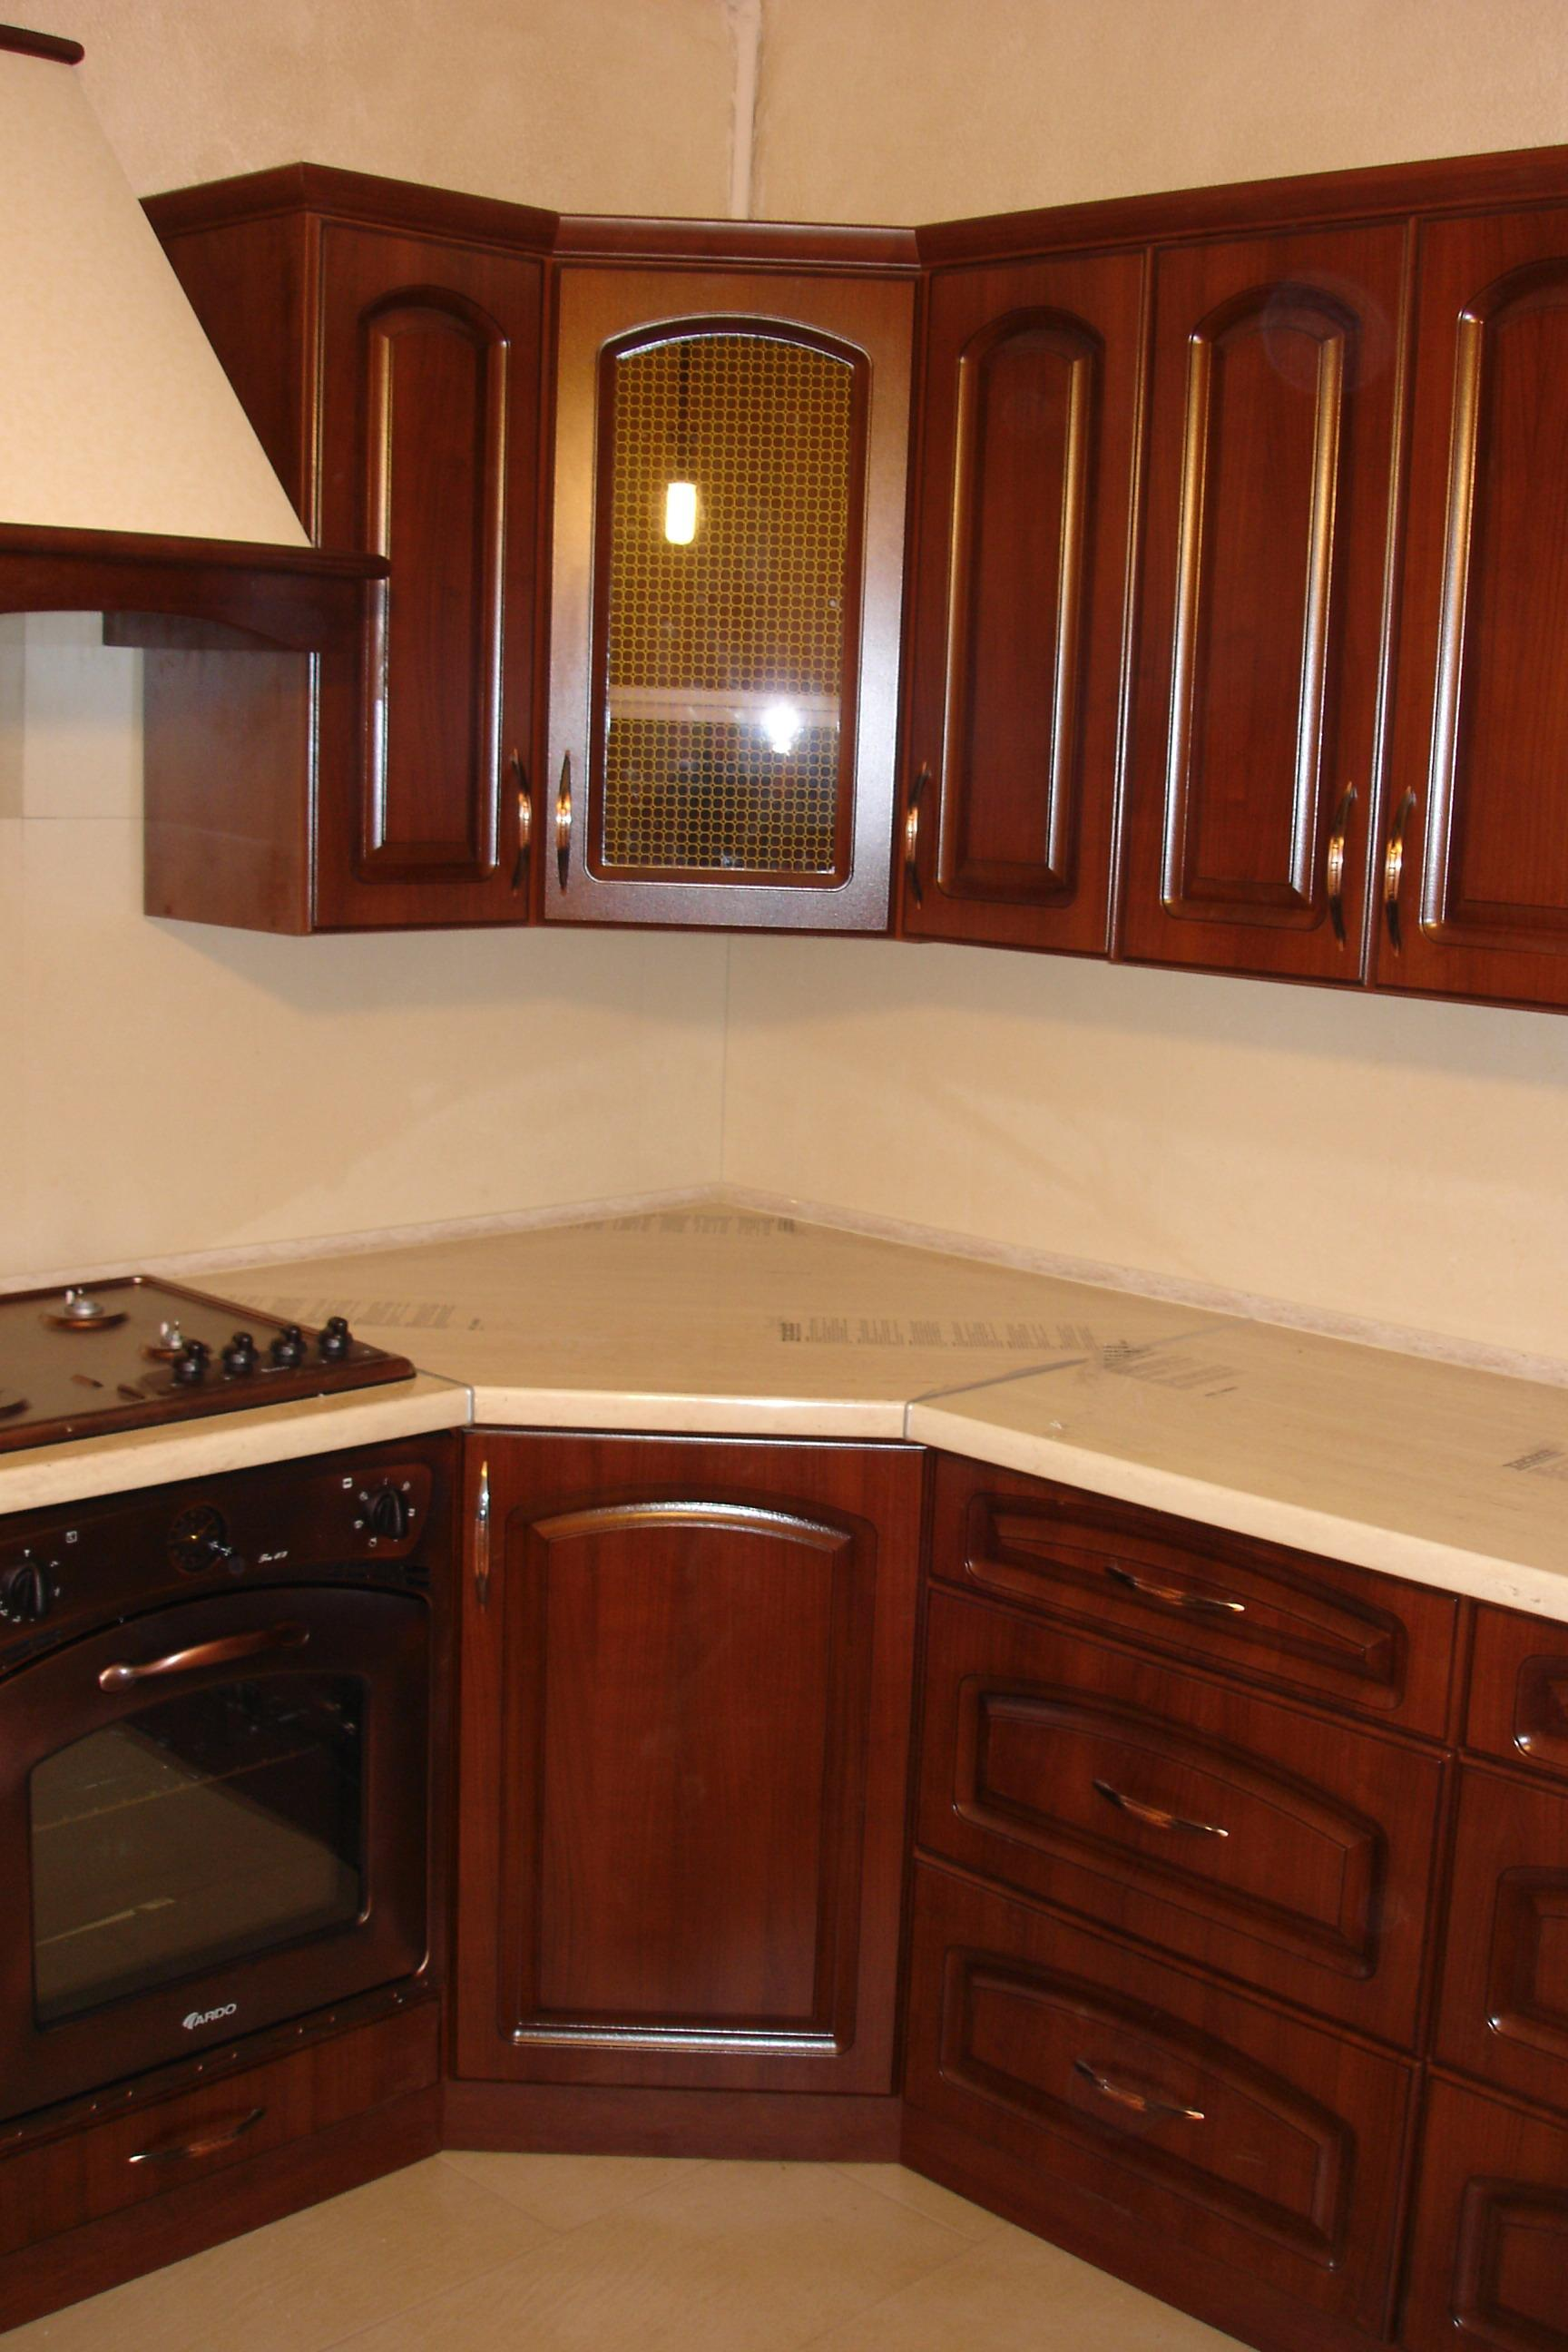 Meuble de cuisine bois massif cuisine bois massif pas for Ensemble meuble de cuisine pas cher